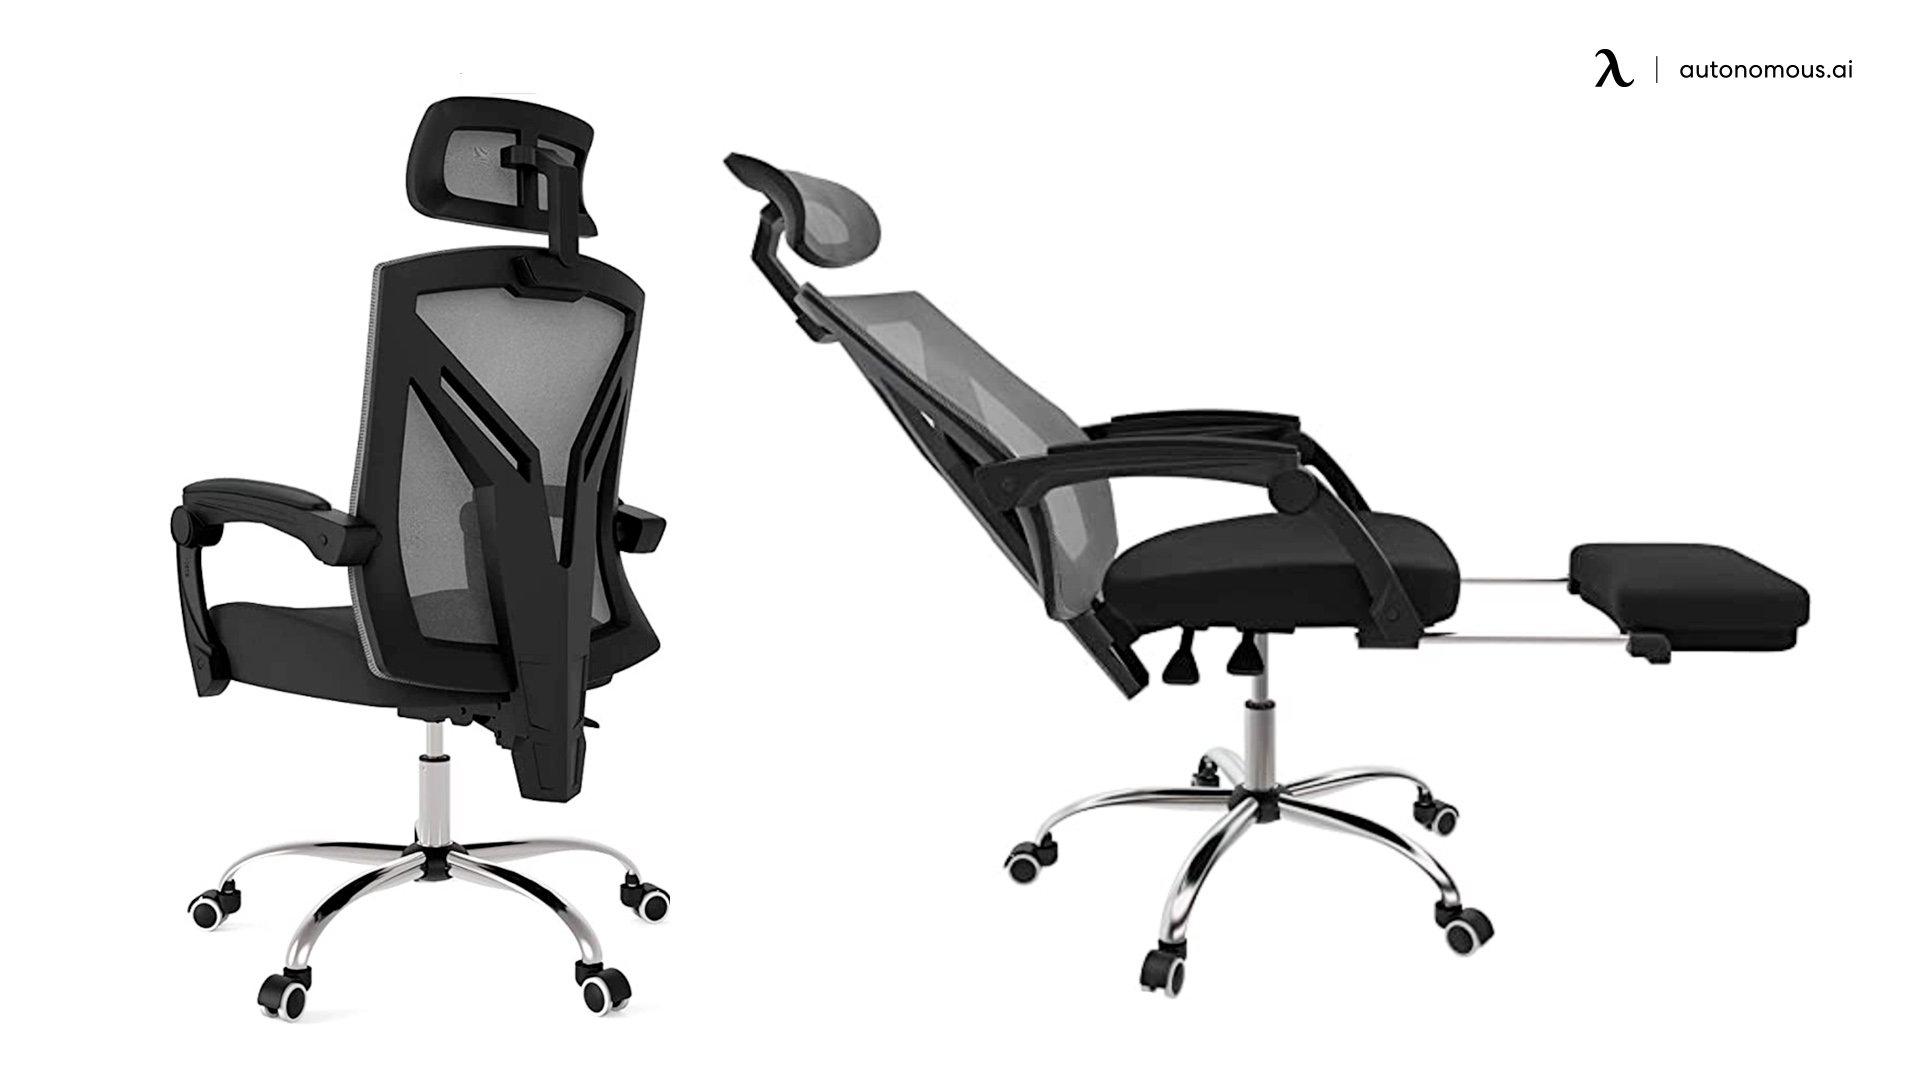 Ergonomic home office chair by HBADA